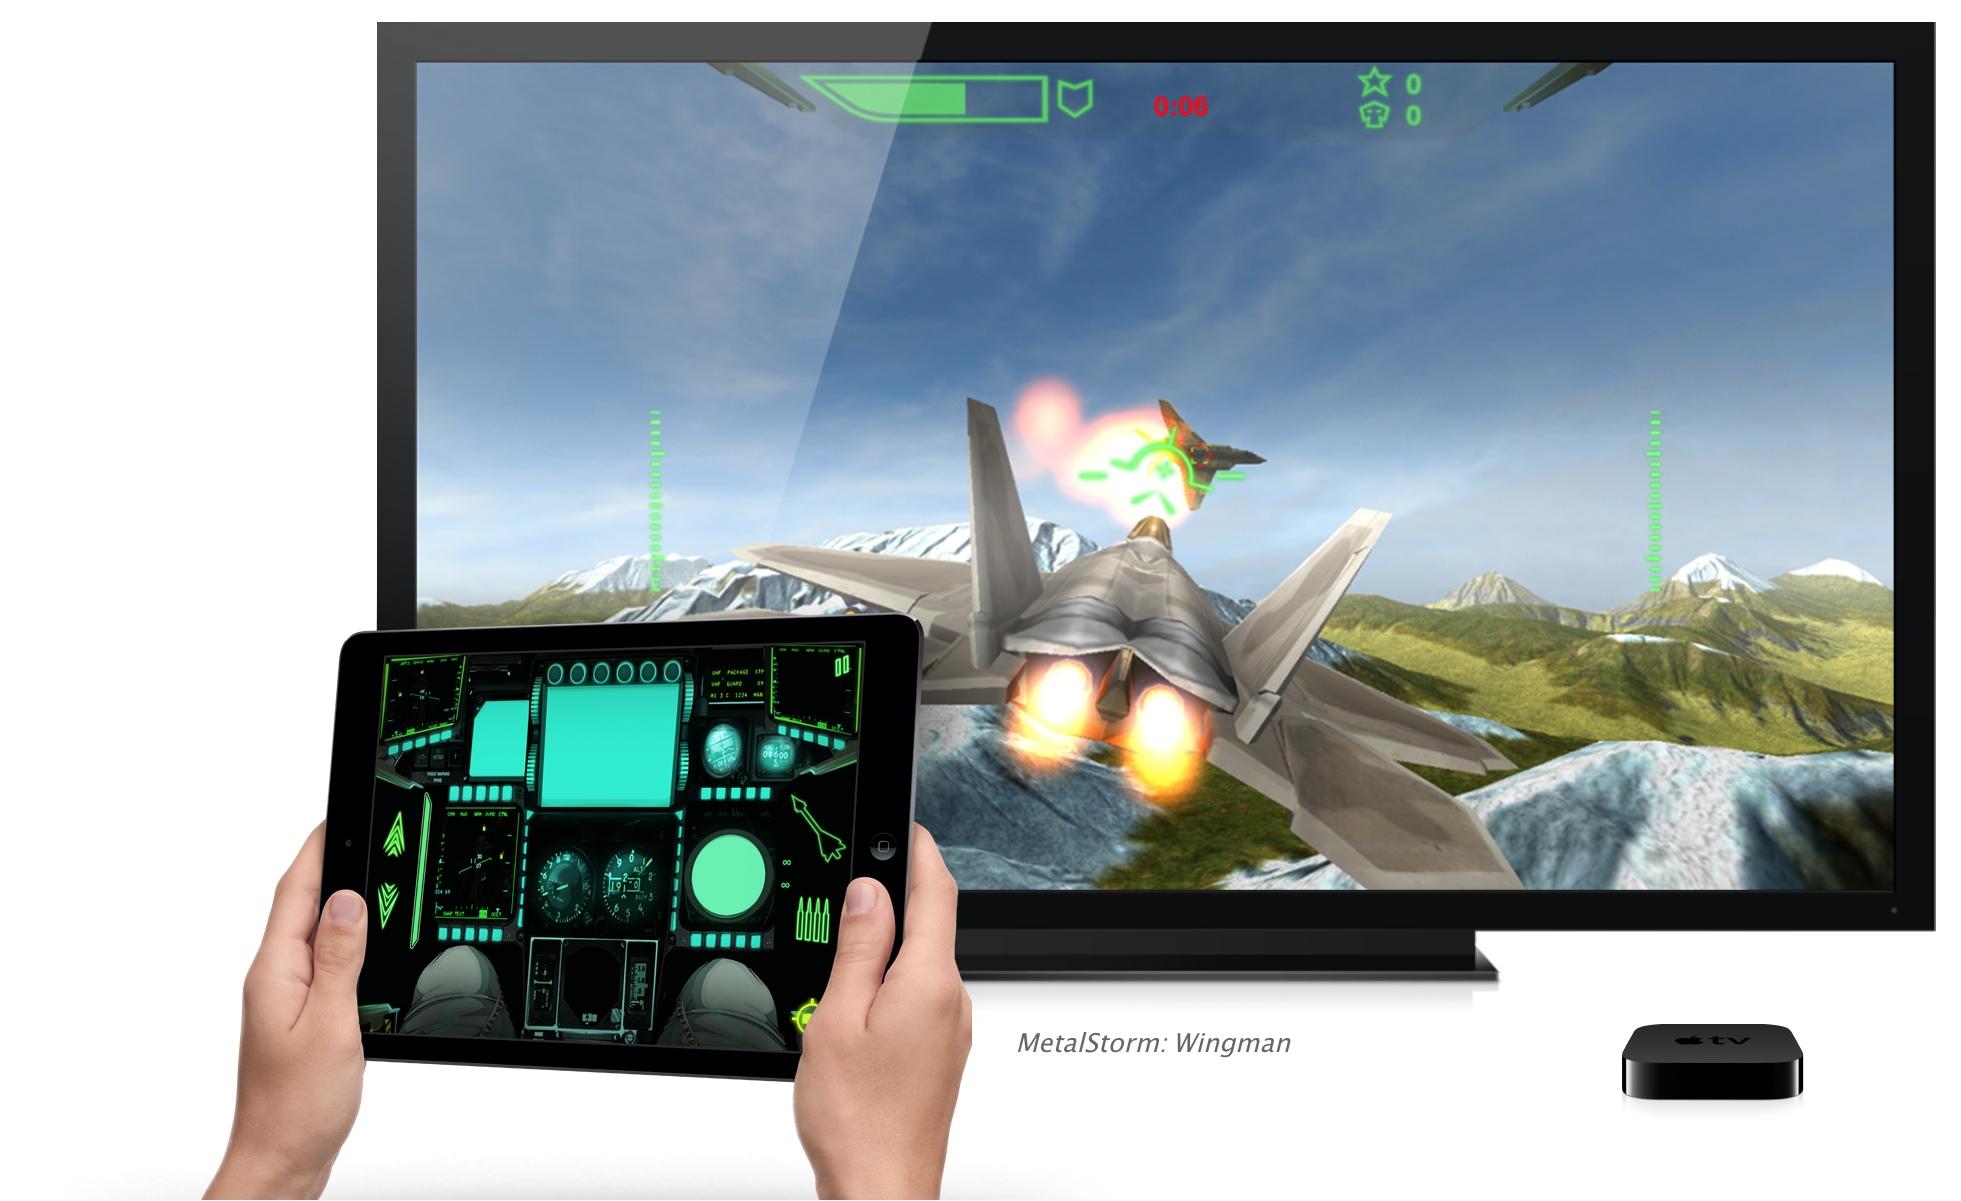 Jogando numa Apple TV pelo iPad